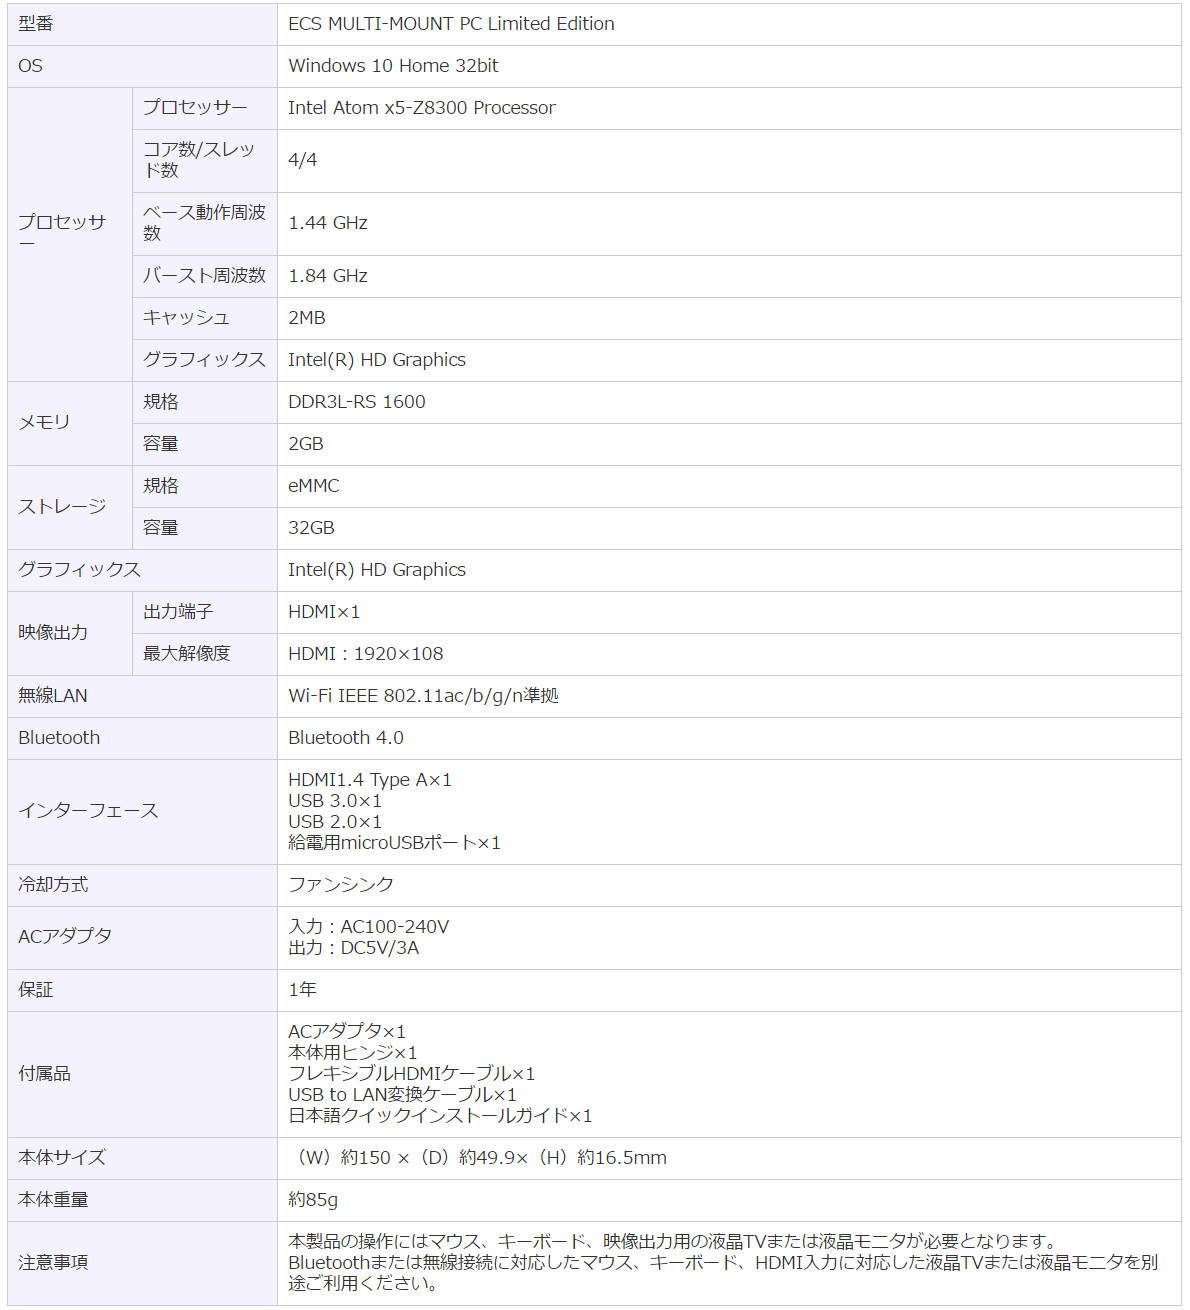 ECS Multi Mount PC Limited Edition スペック表